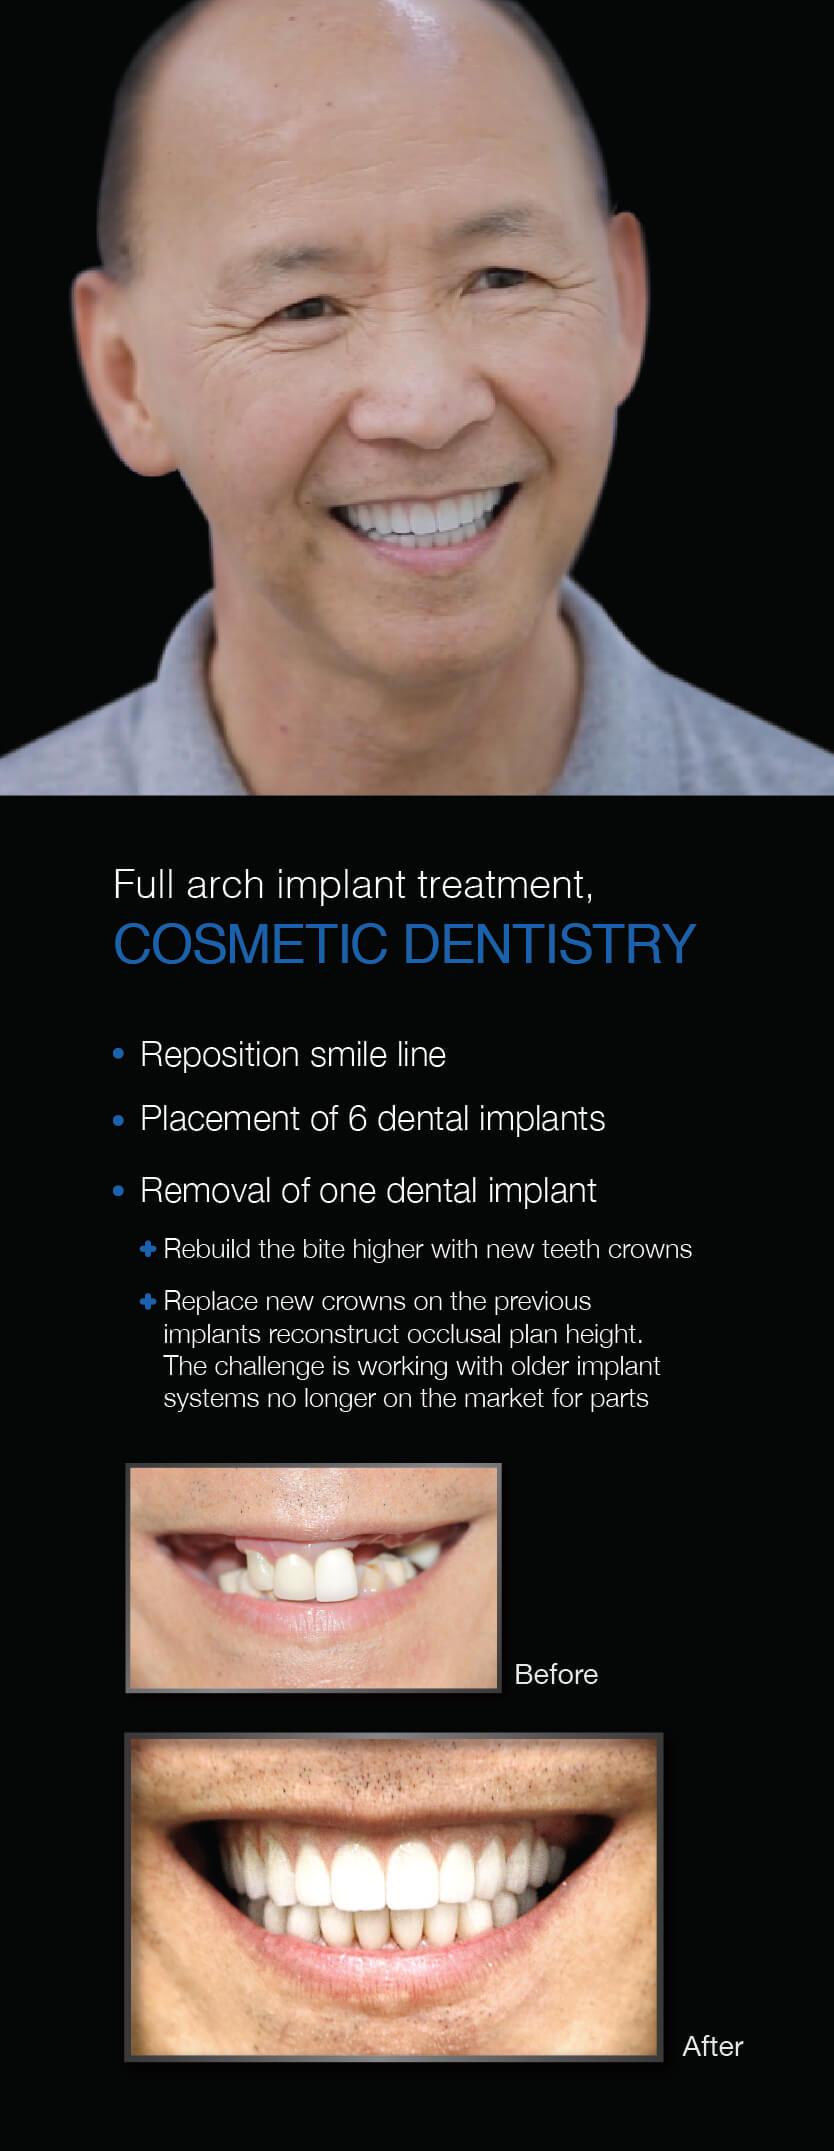 implant-treatment-at-westcoast-international-dental-clinic